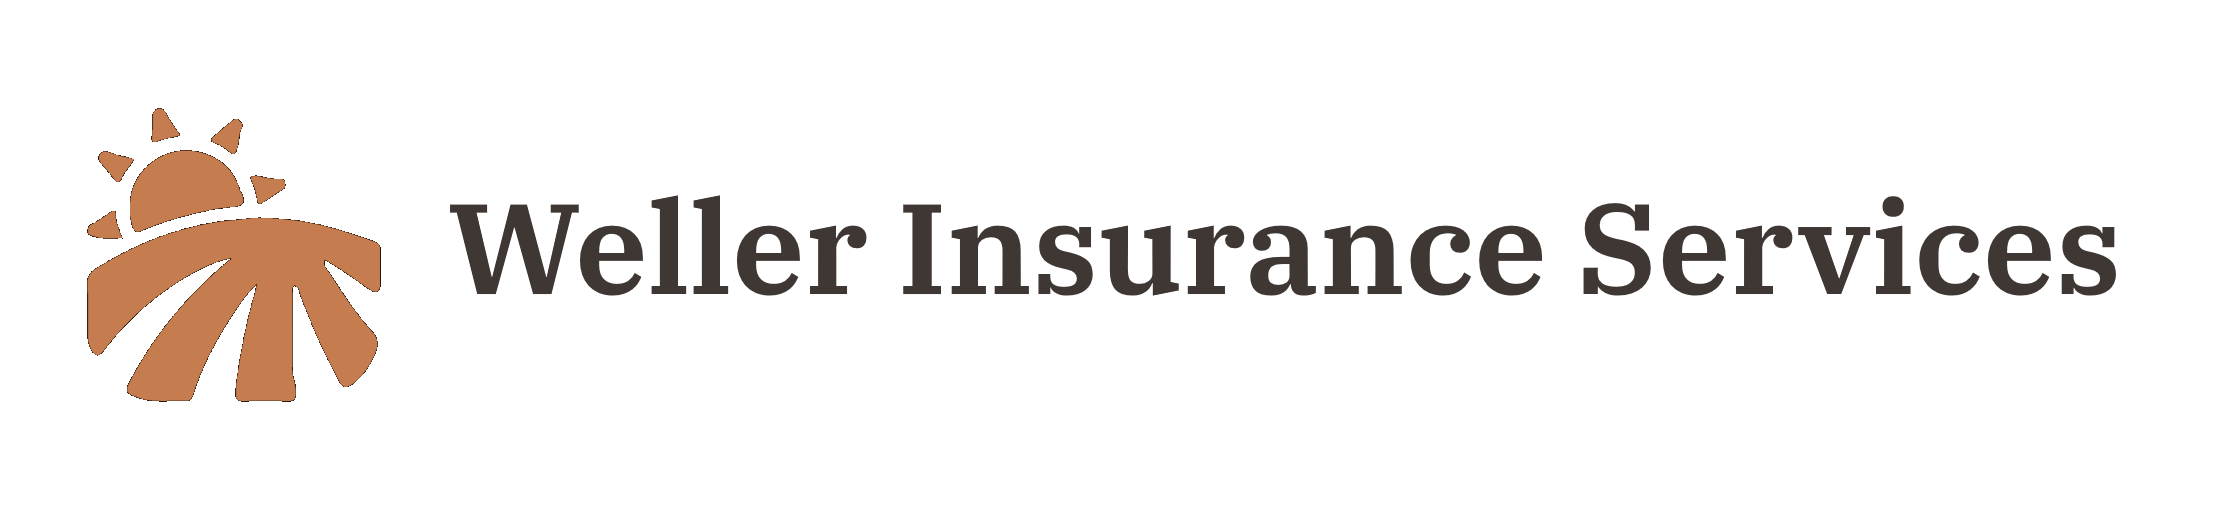 Weller Insurance Services